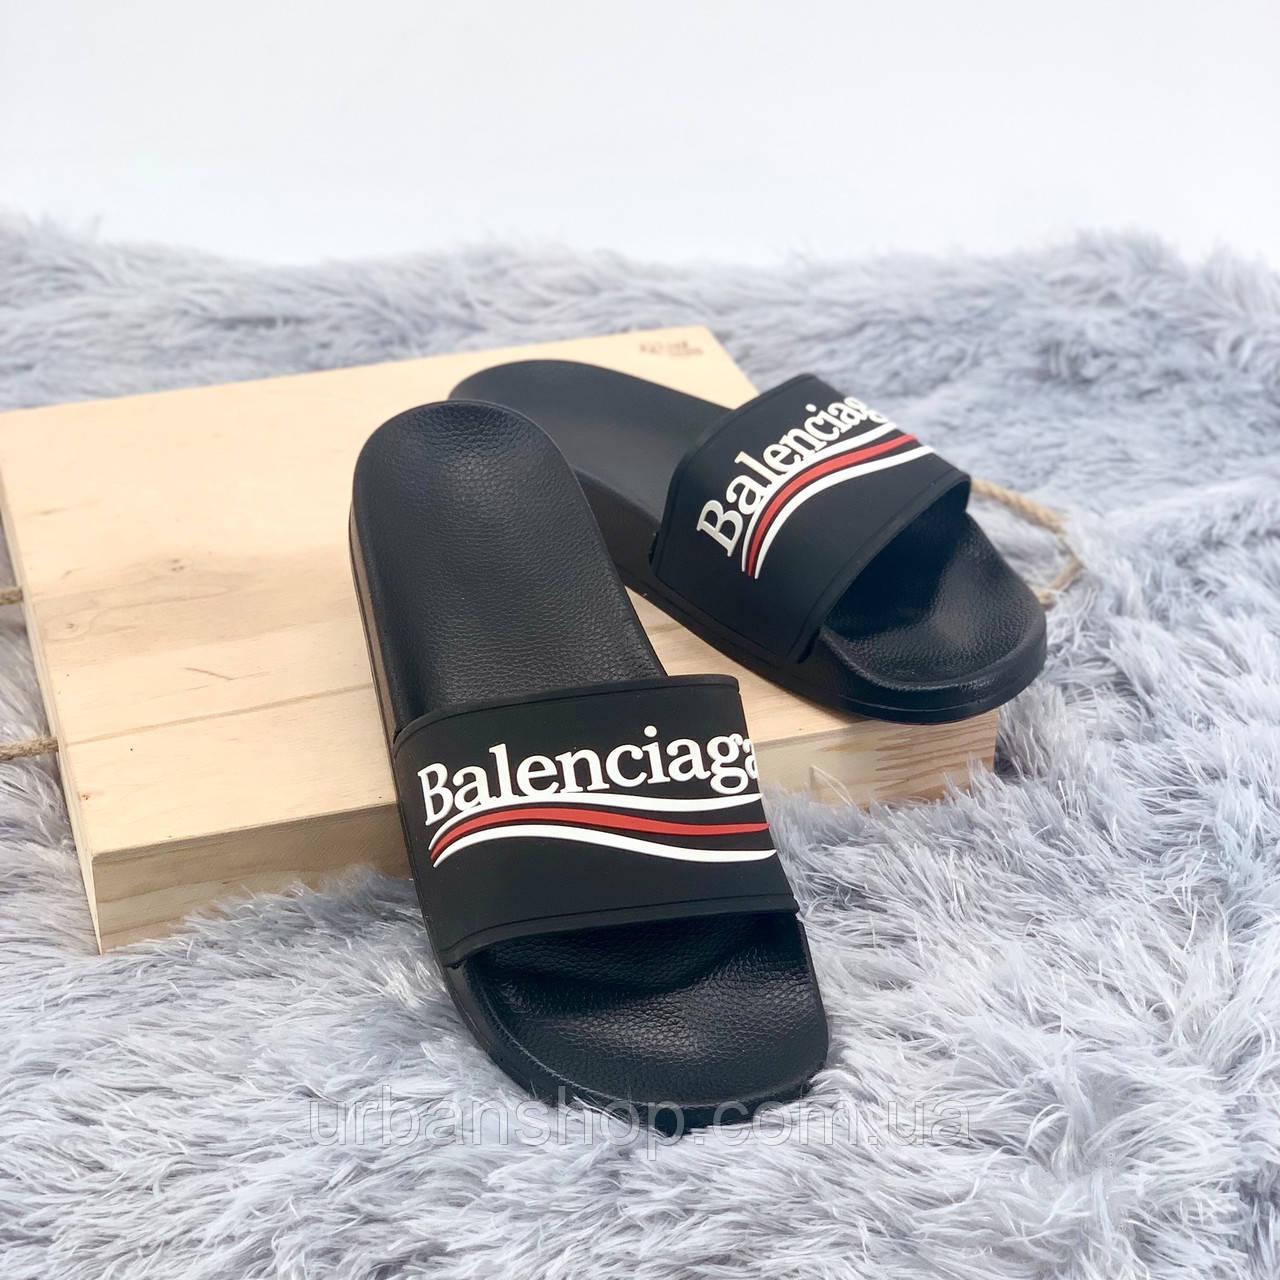 Взуття Balenciaga Balenciaga Black Classic 40